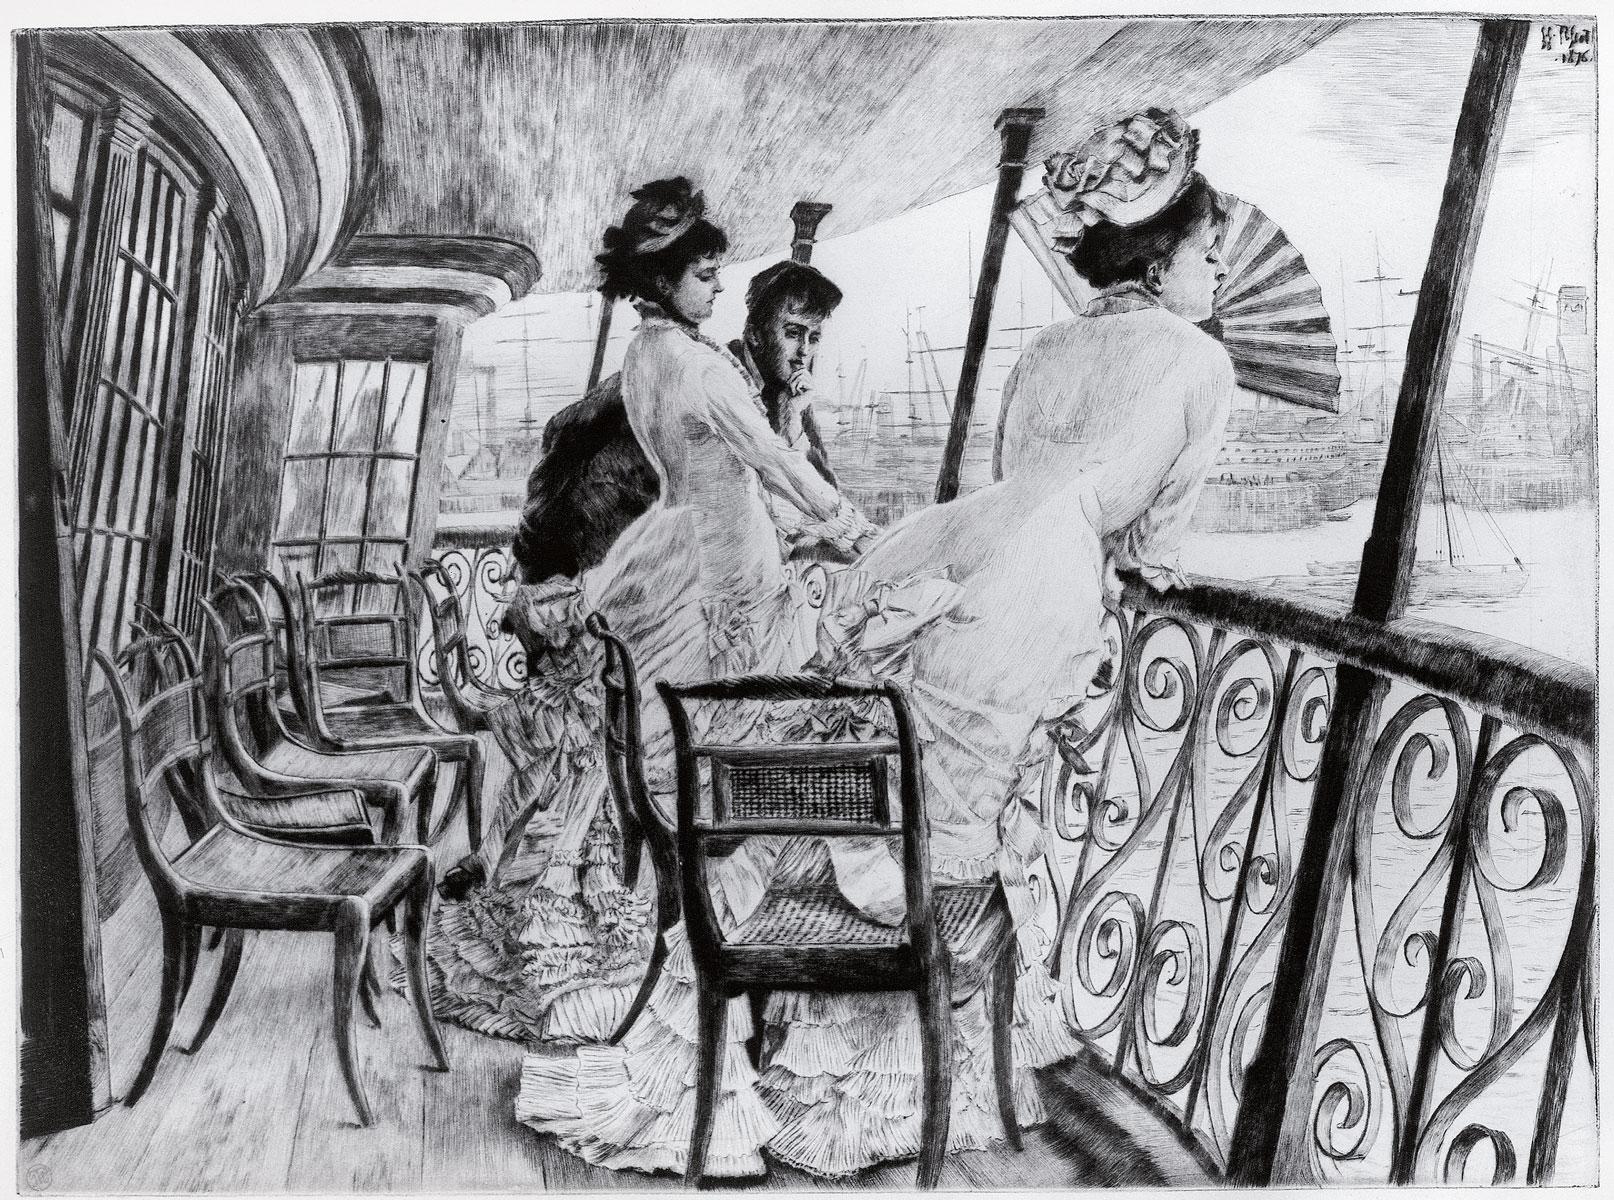 James (Jacques) Tissot, An Bord der Calcutta, 1876; Kunsthalle Bremen; © Kunsthalle Bremen – Der Kunstverein in Bremen